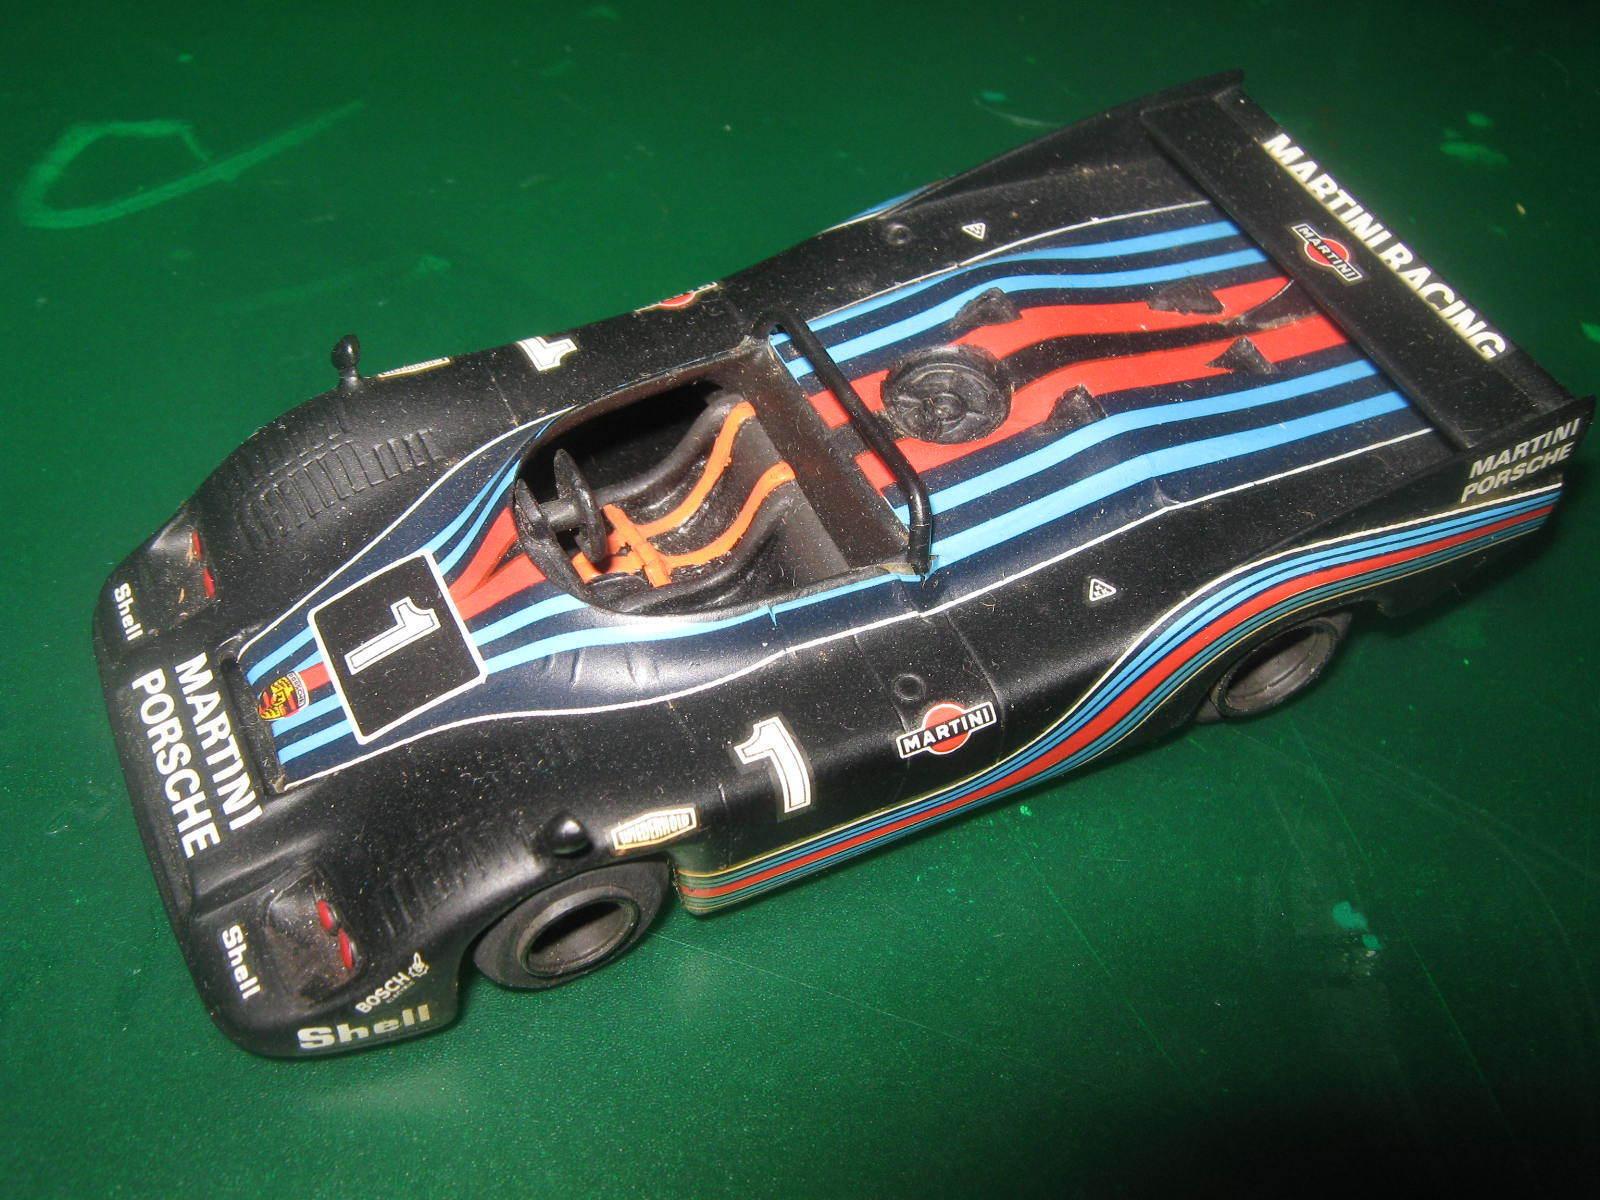 1 43 Porsche 936 Turbo 1976 F.D.S. Nr. 48 ready ready ready built in showcase 904266